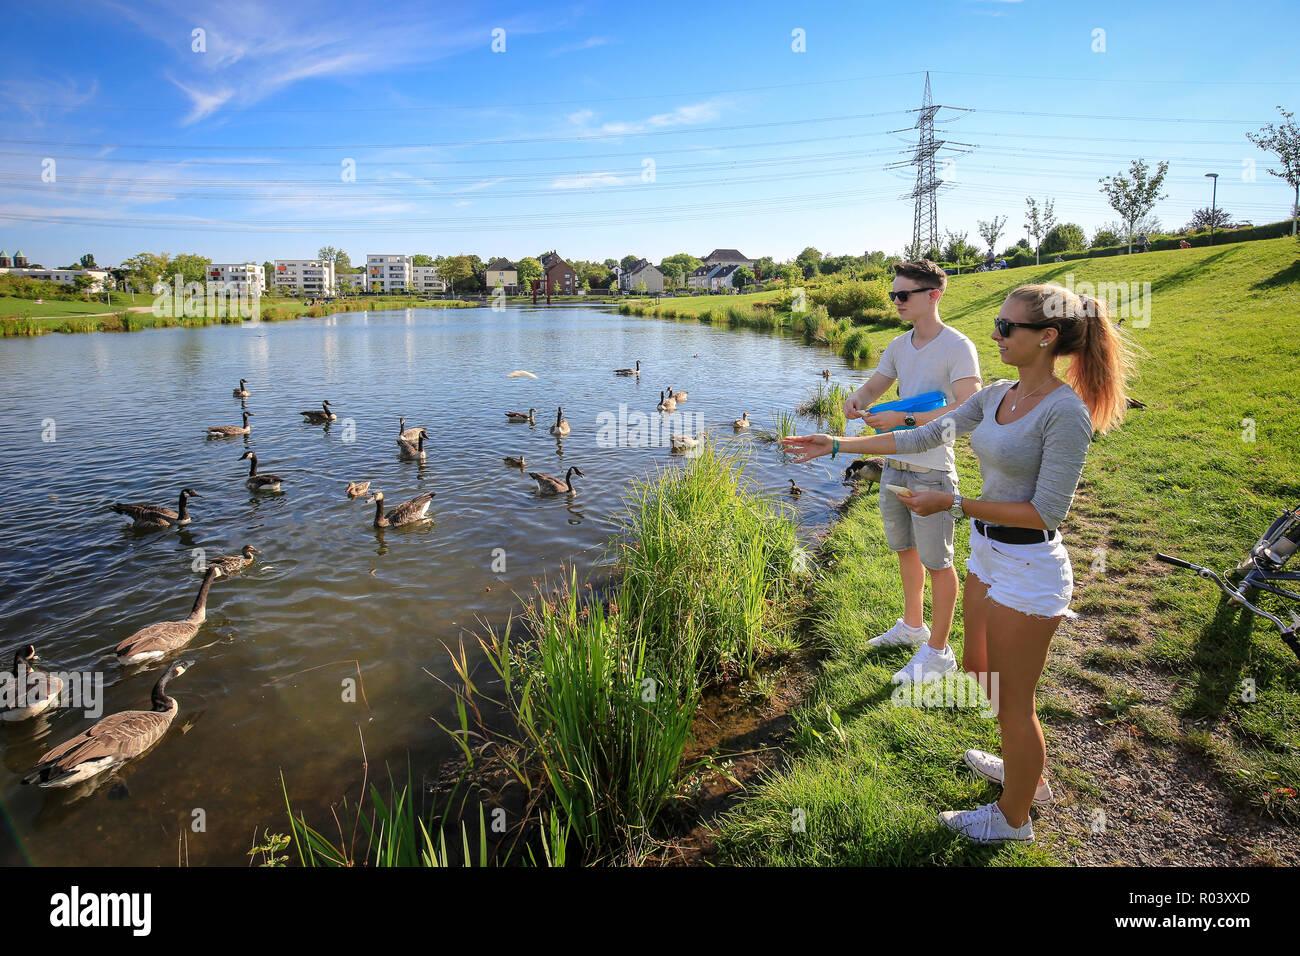 Essen, Ruhr area, Germany, urban development project Niederfeldsee, young couple feeds Canada agaenas - Stock Image